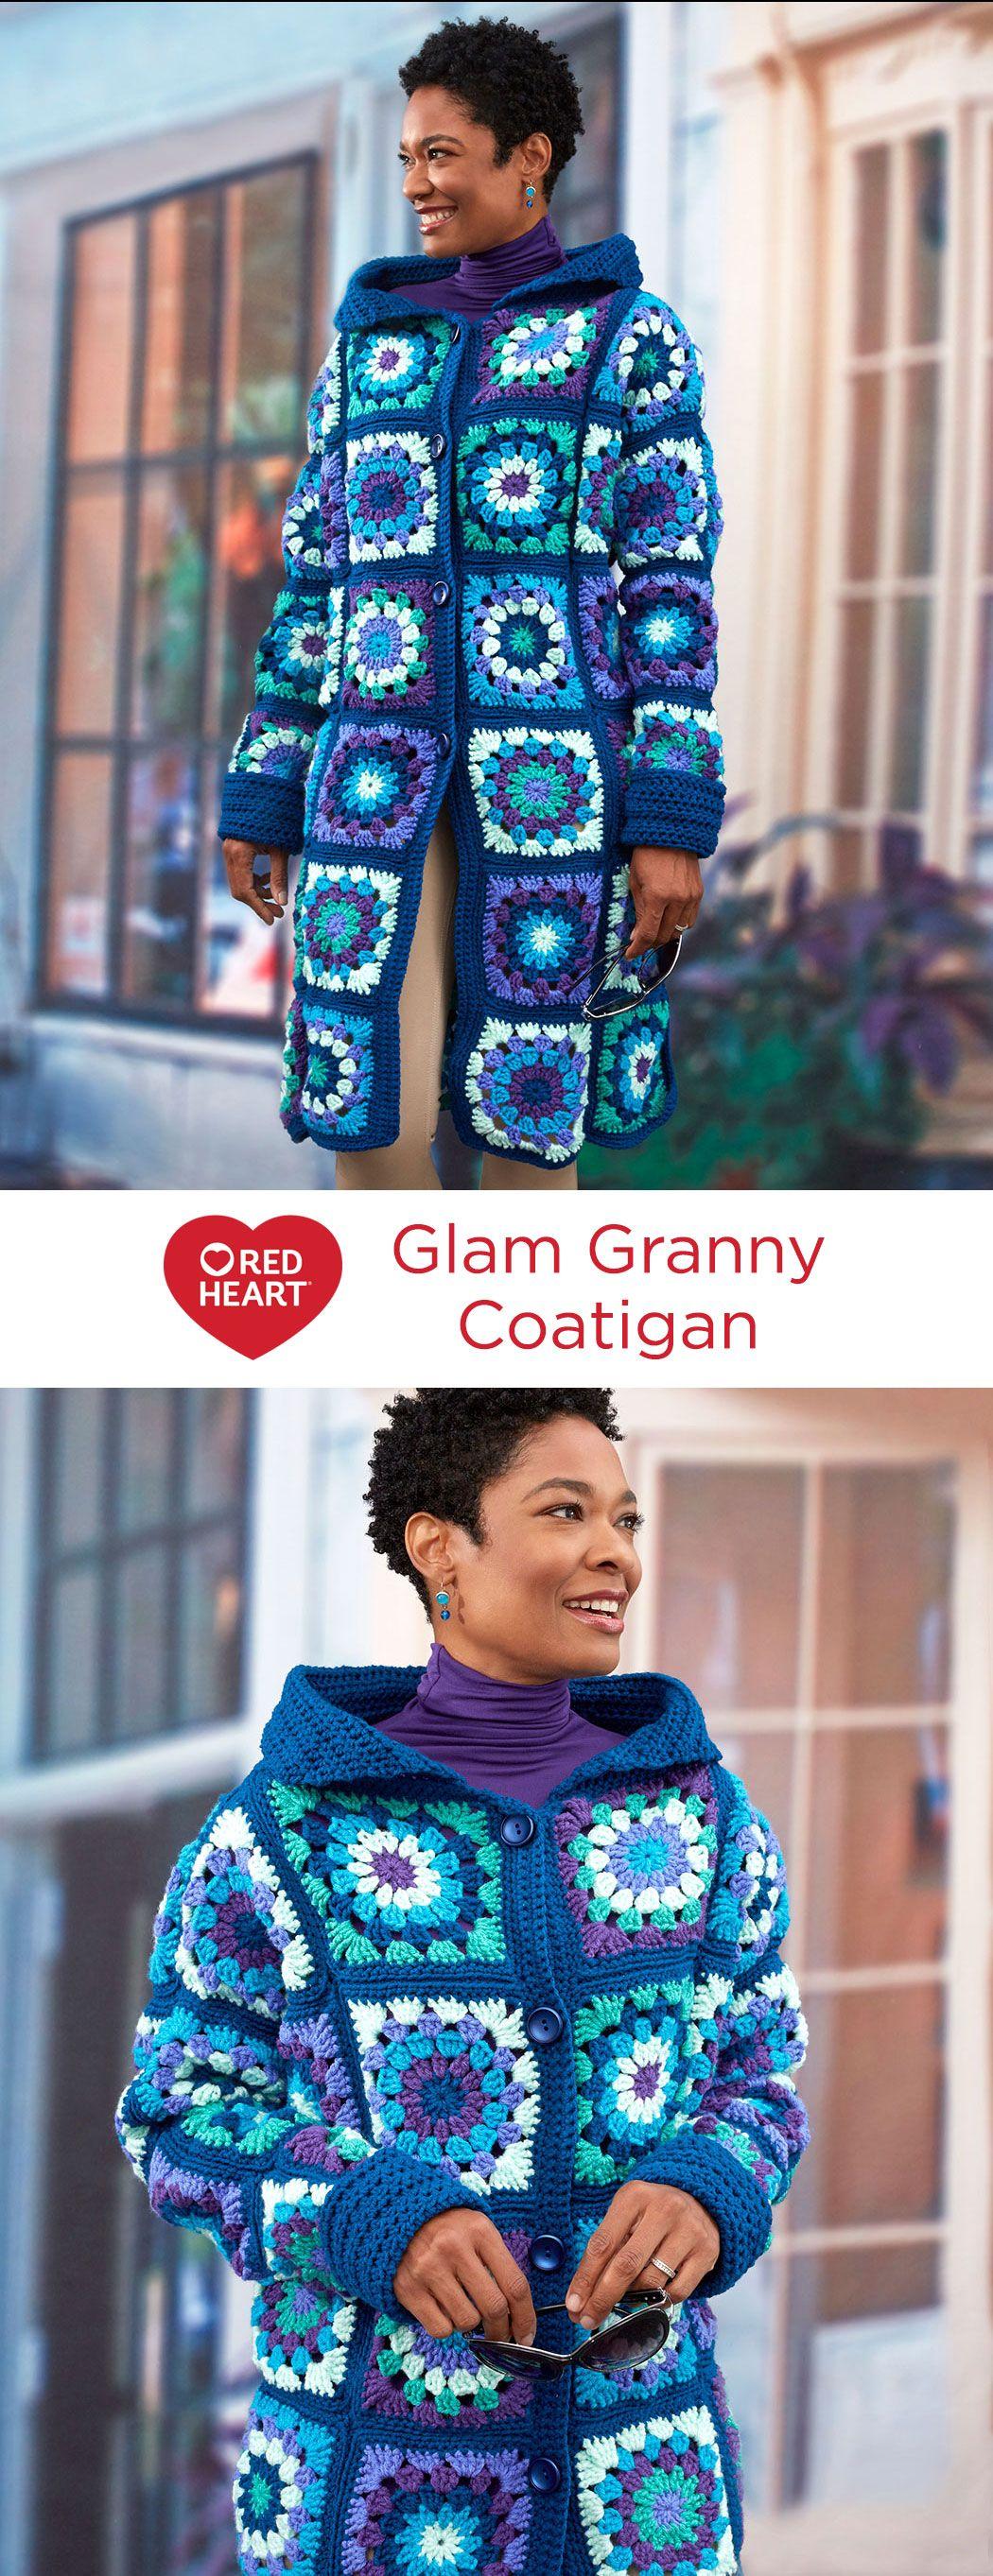 Glam Granny Coatigan Free Crochet Pattern In Red Heart Yarns